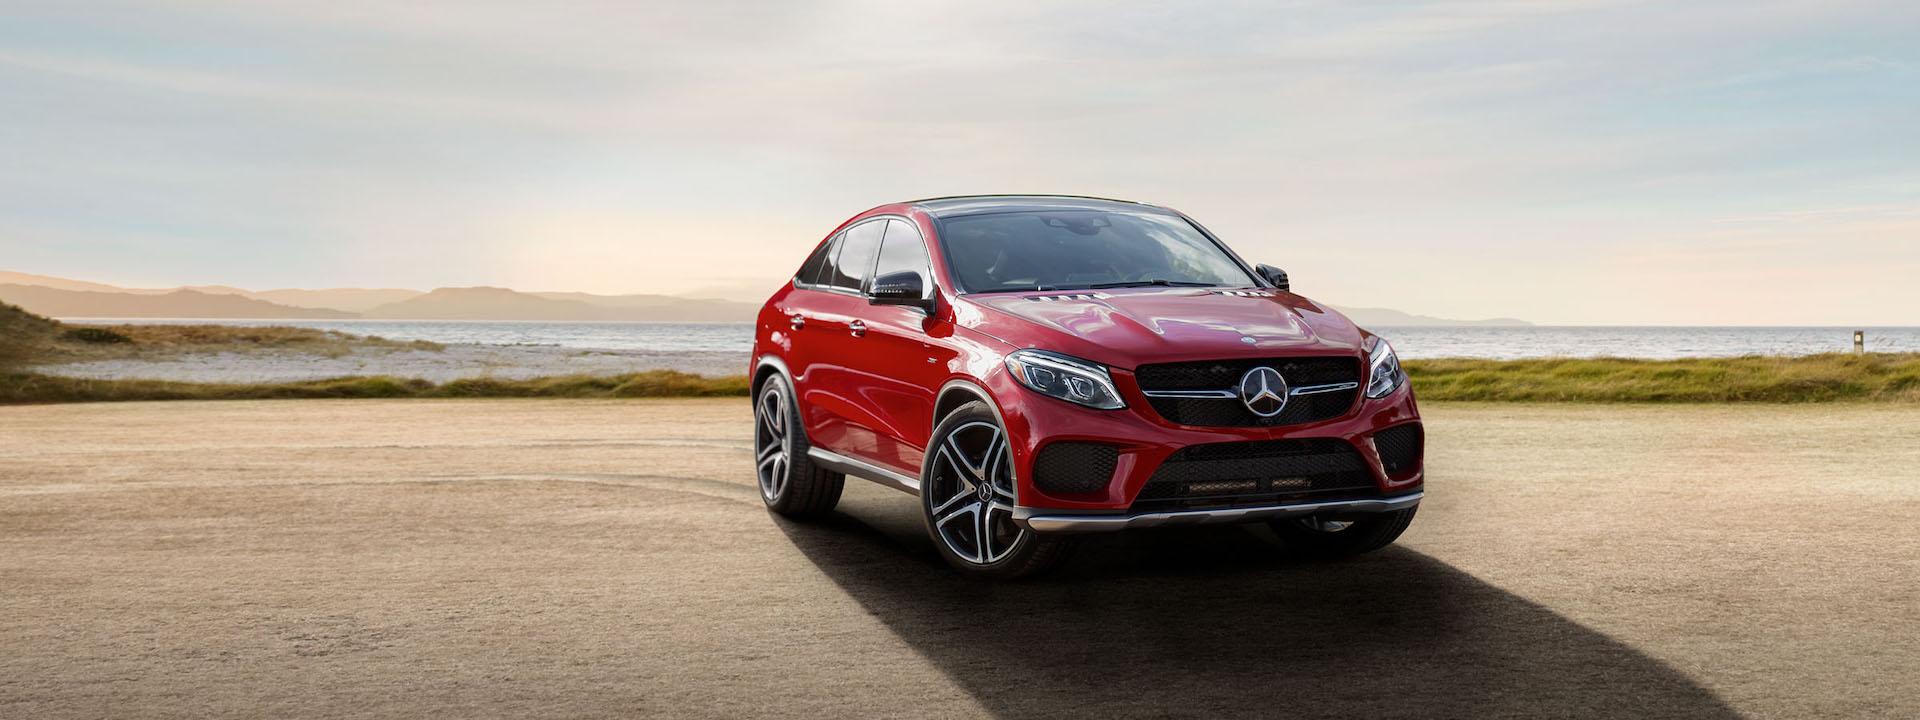 2020 Mercedes-Benz GLE Coupe | ZT Motors of Fort Walton Beach